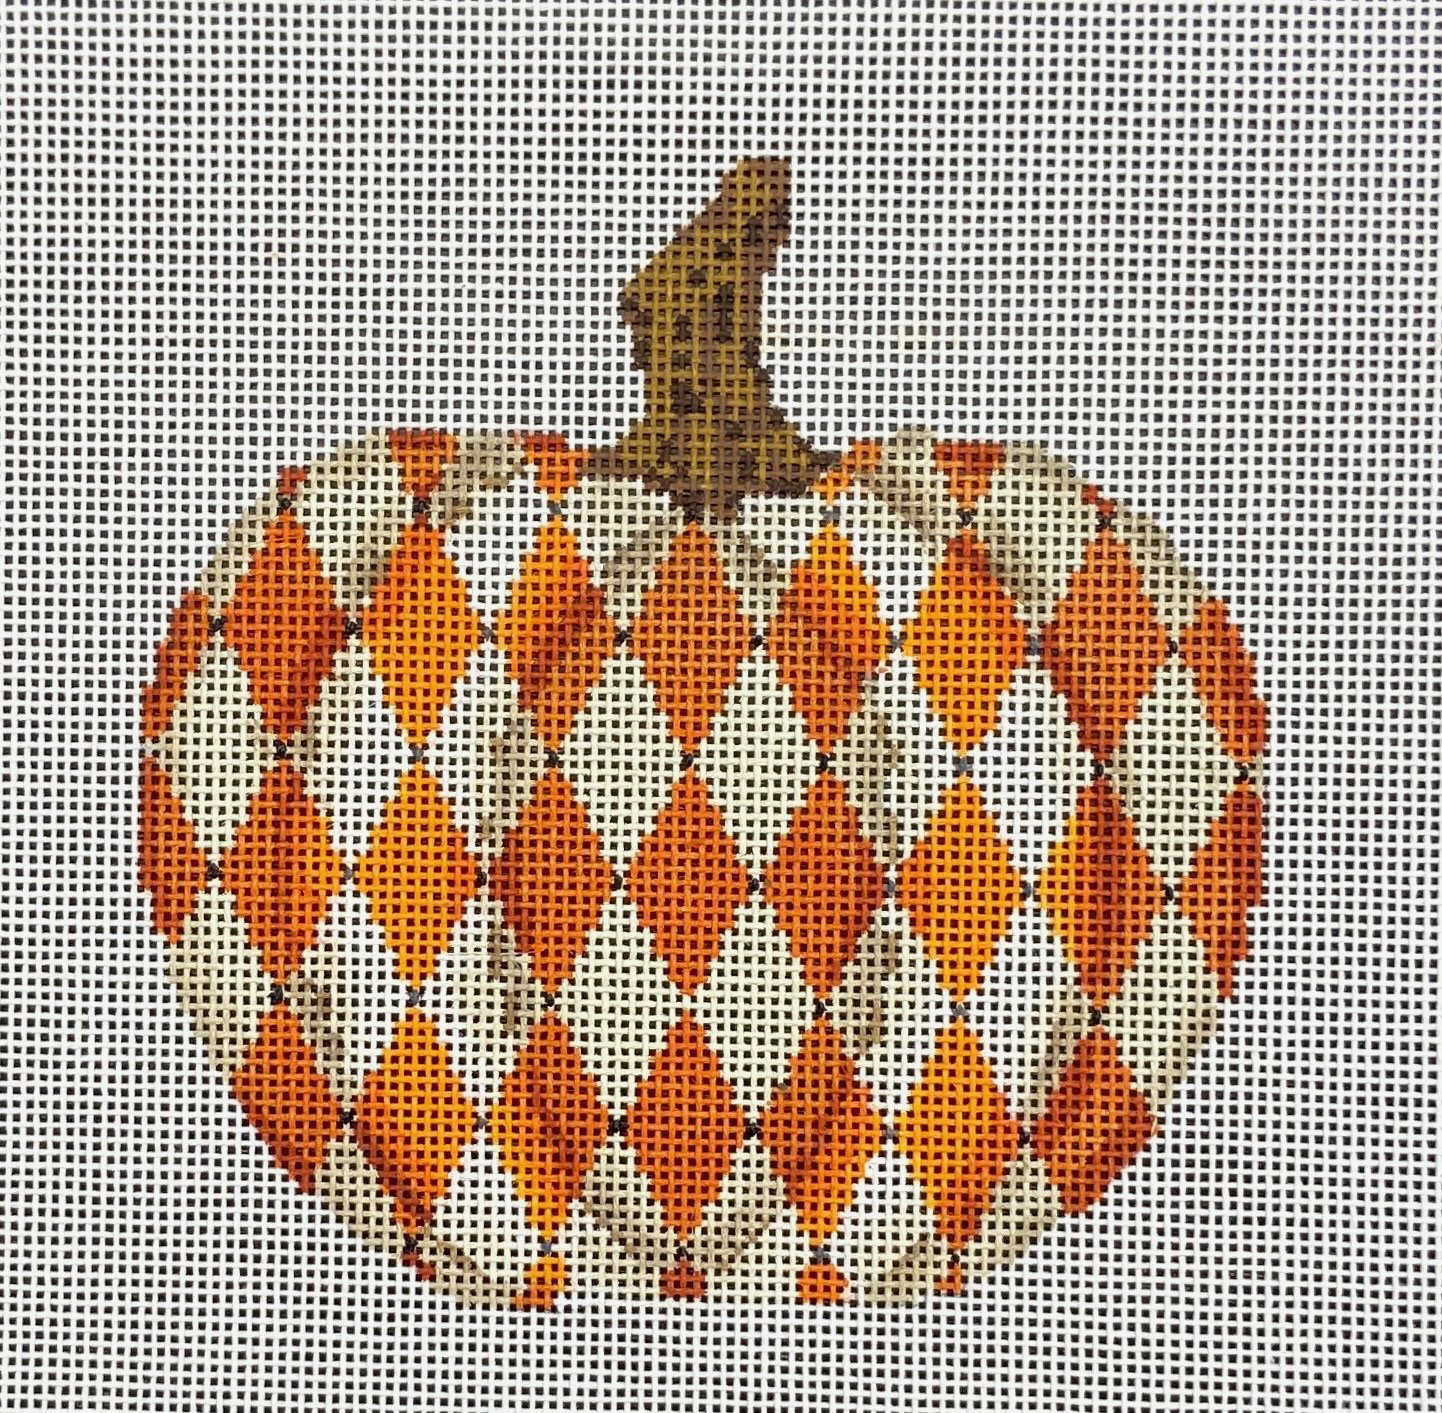 KCKCN1555 Hallowed Harlequin Pumpkin Colonial